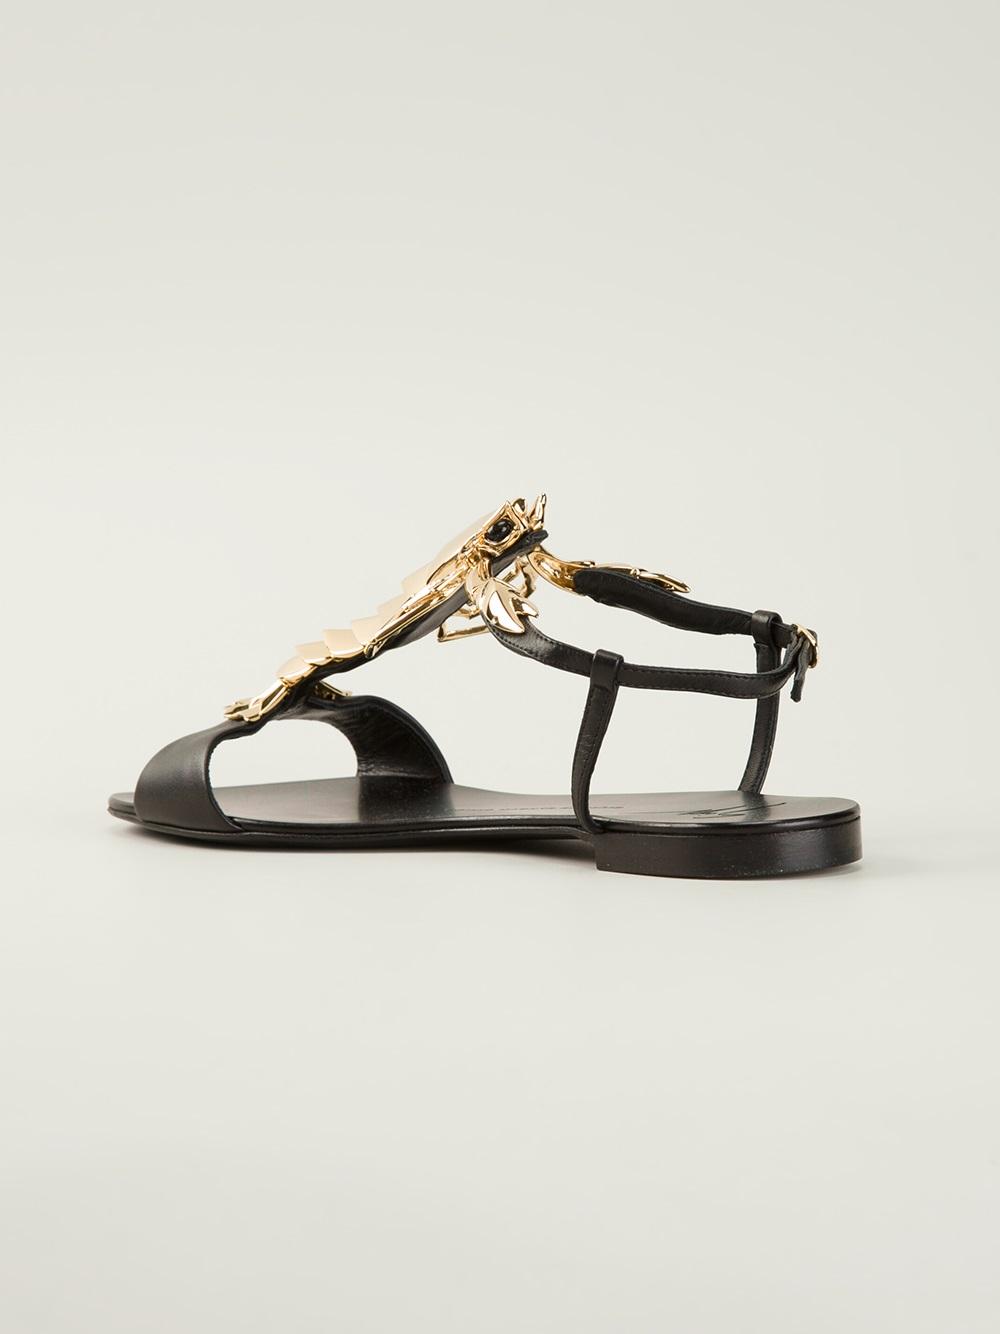 b148760f240ec3 Lyst - Giuseppe Zanotti Lobster Flat Sandal in Metallic